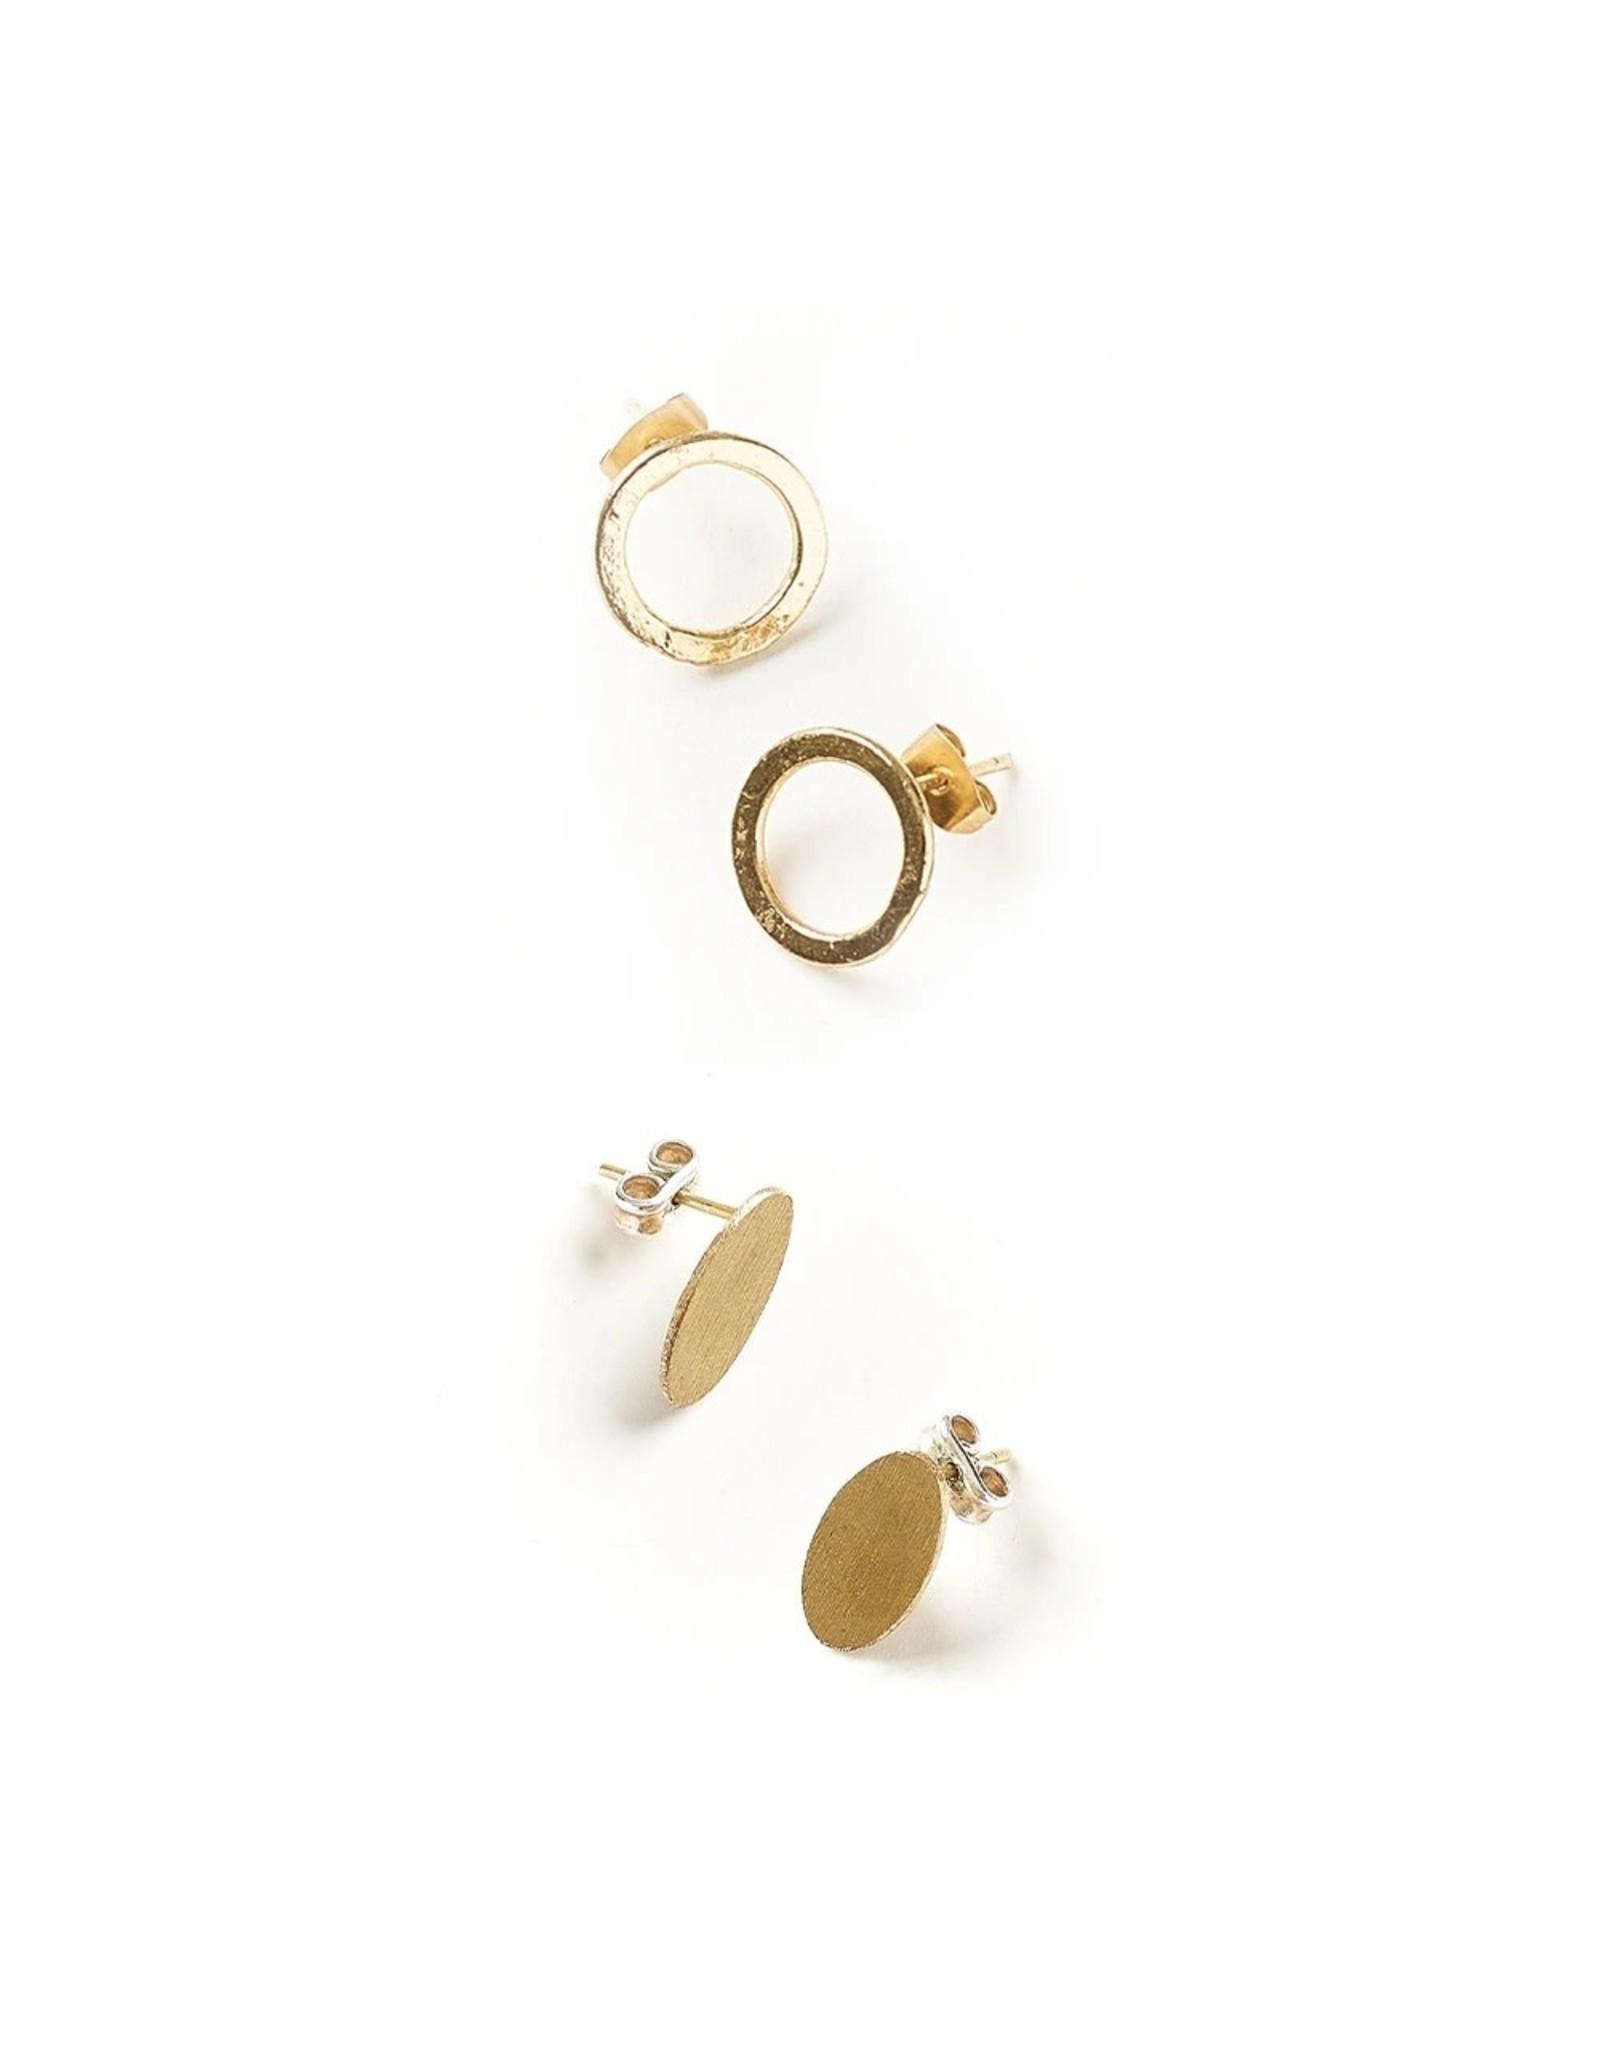 Matr Boomie Diya Earrings- Circle & Oval set, India